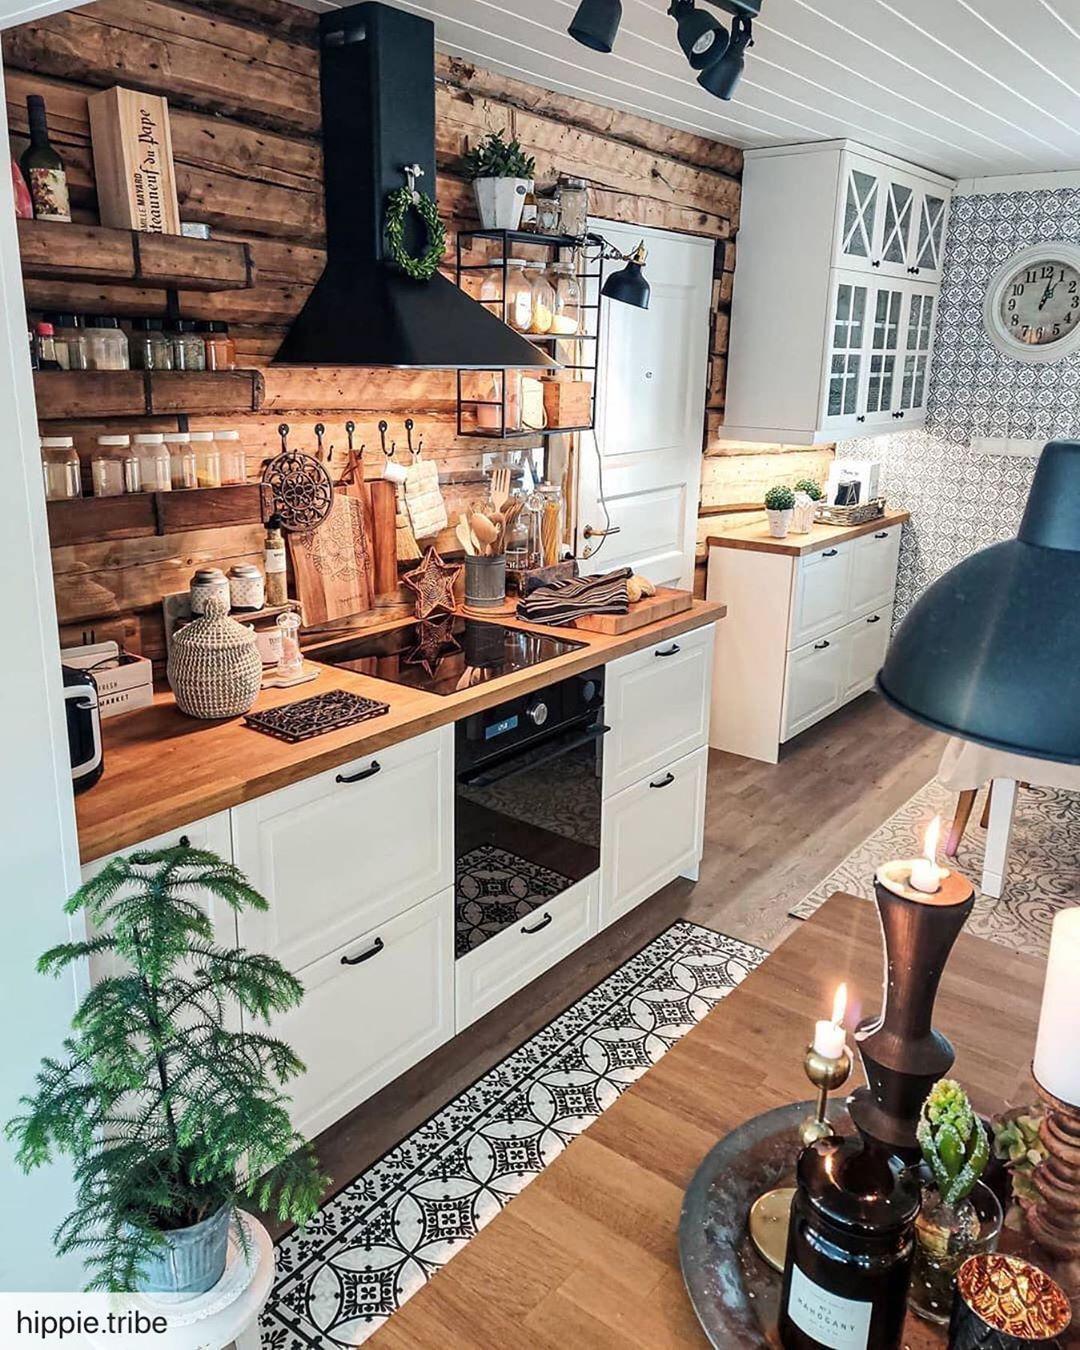 5 Tips To Follow To Successfully Decorate Your Living Room Read More Livingroomgoals Homedesign Livingroominspiration D In 2020 Kuchenstil Kuche Kuchen Ideen